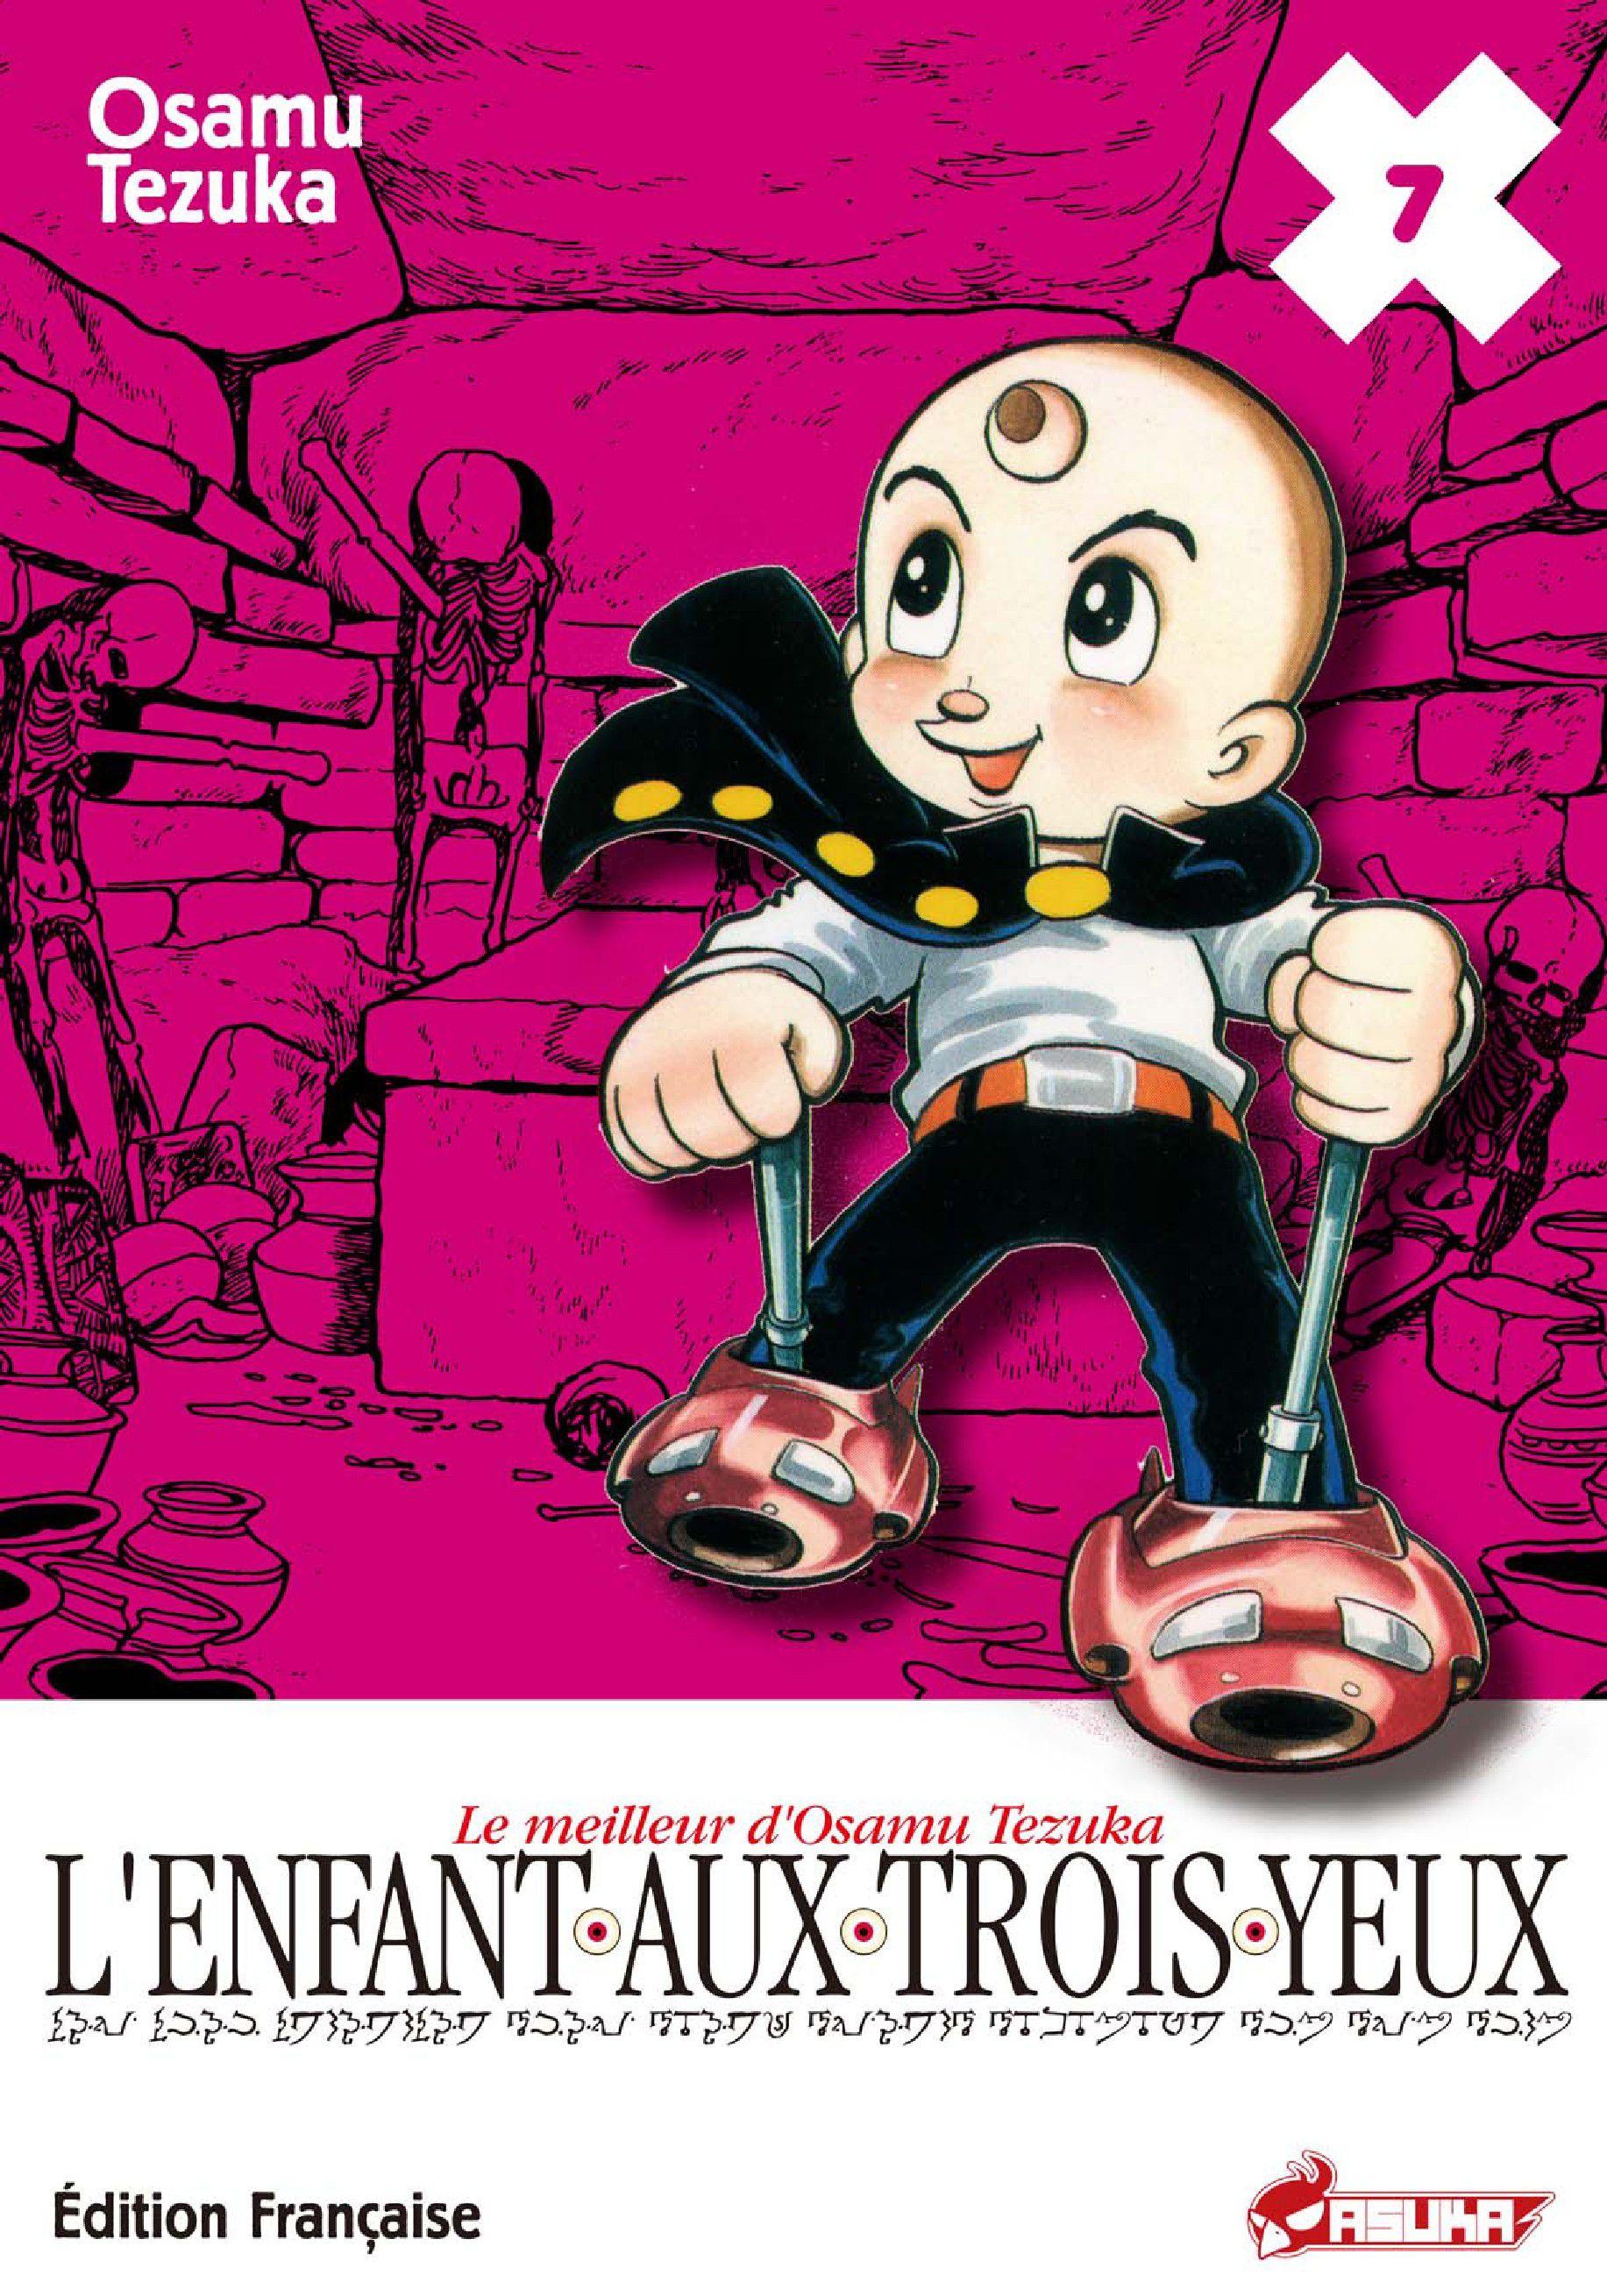 https://nine.mangadogs.com/fr_manga/pic1/13/1357/53882/L039EnfantAuxTroisYeuxVolu_0_959.jpg Page 1